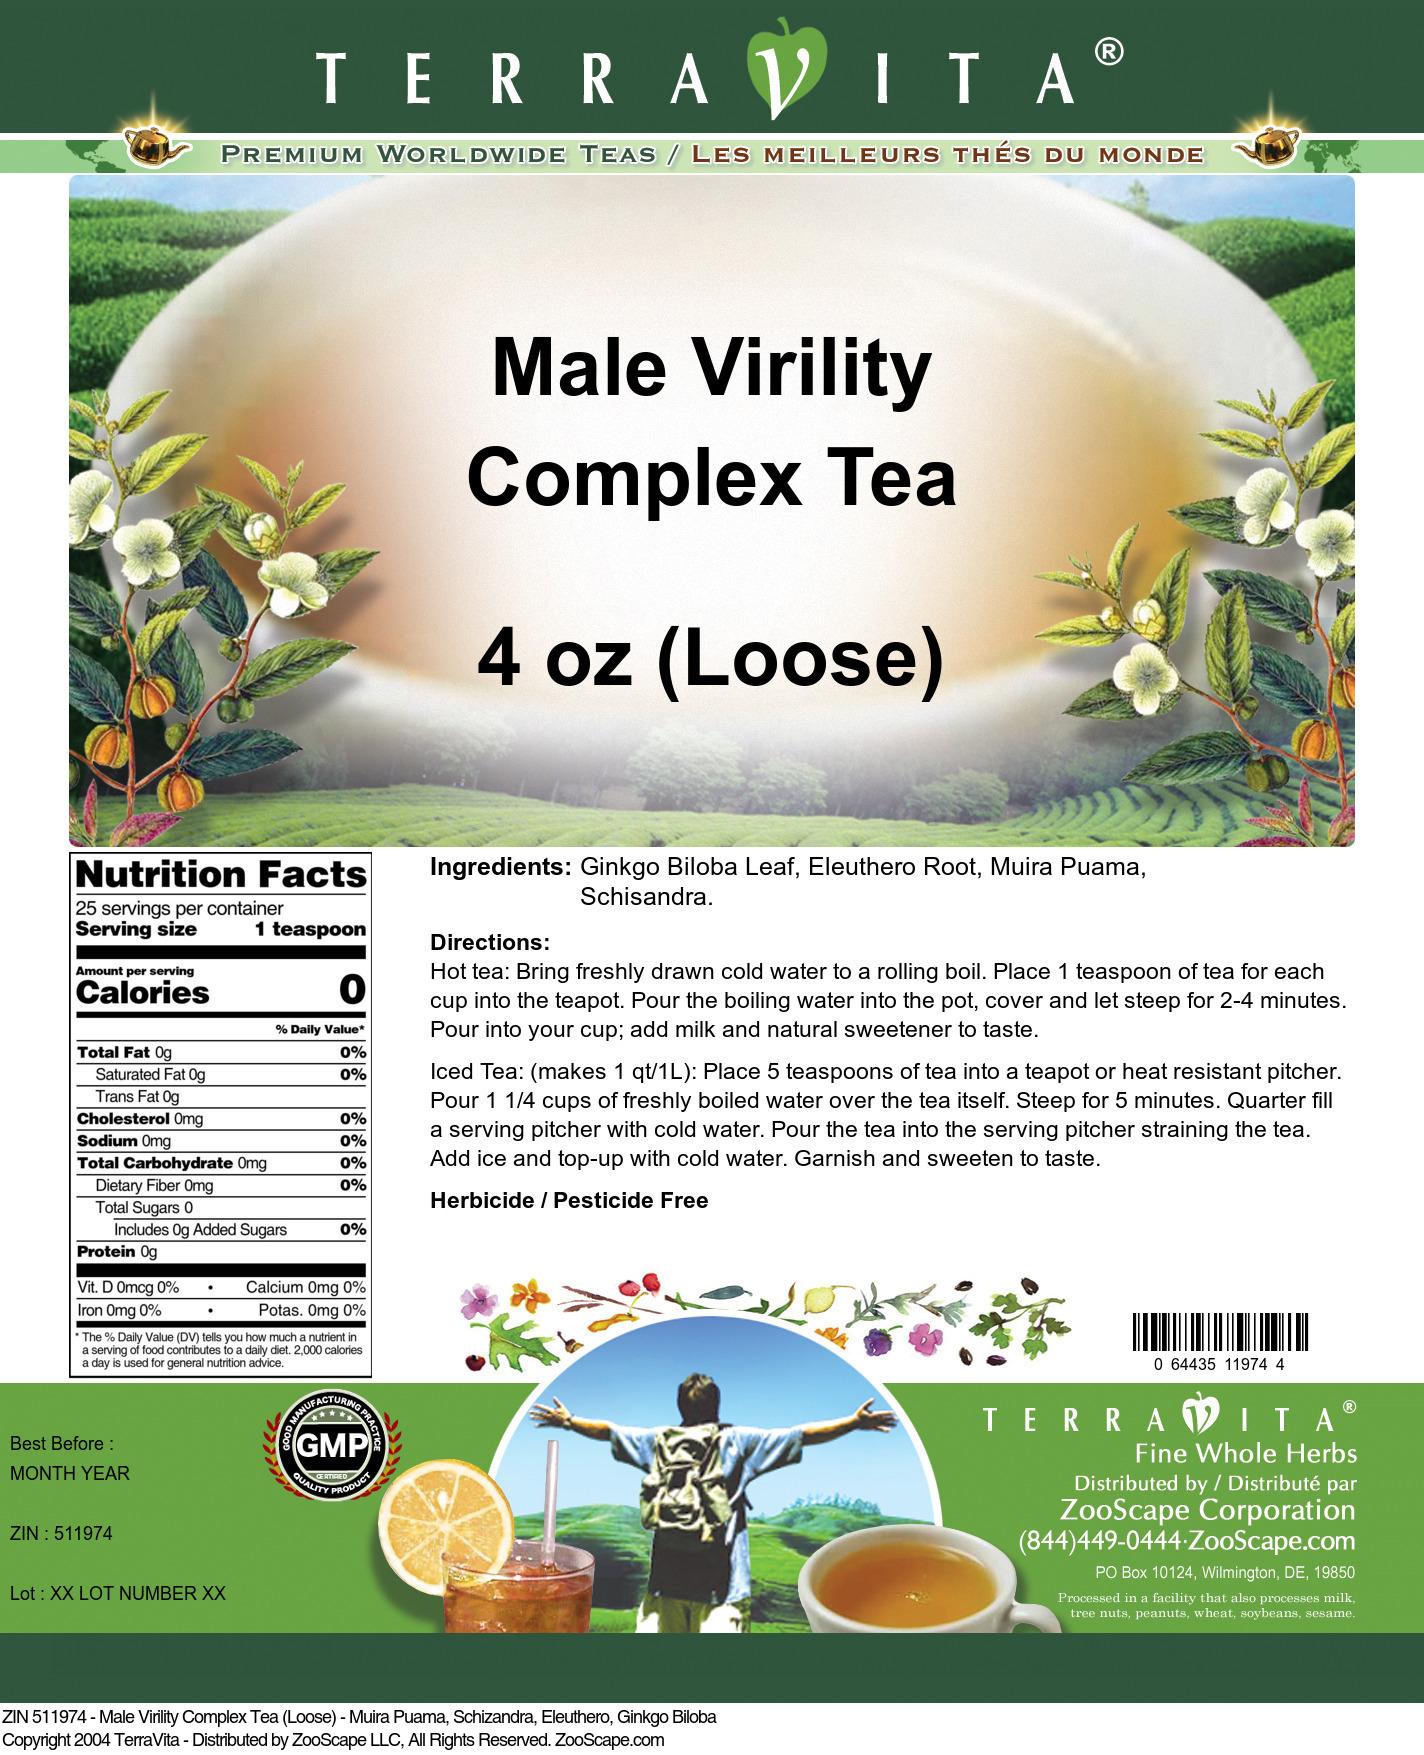 Male Virility Complex Tea (Loose) - Muira Puama, Schizandra, Eleuthero, Ginkgo Biloba